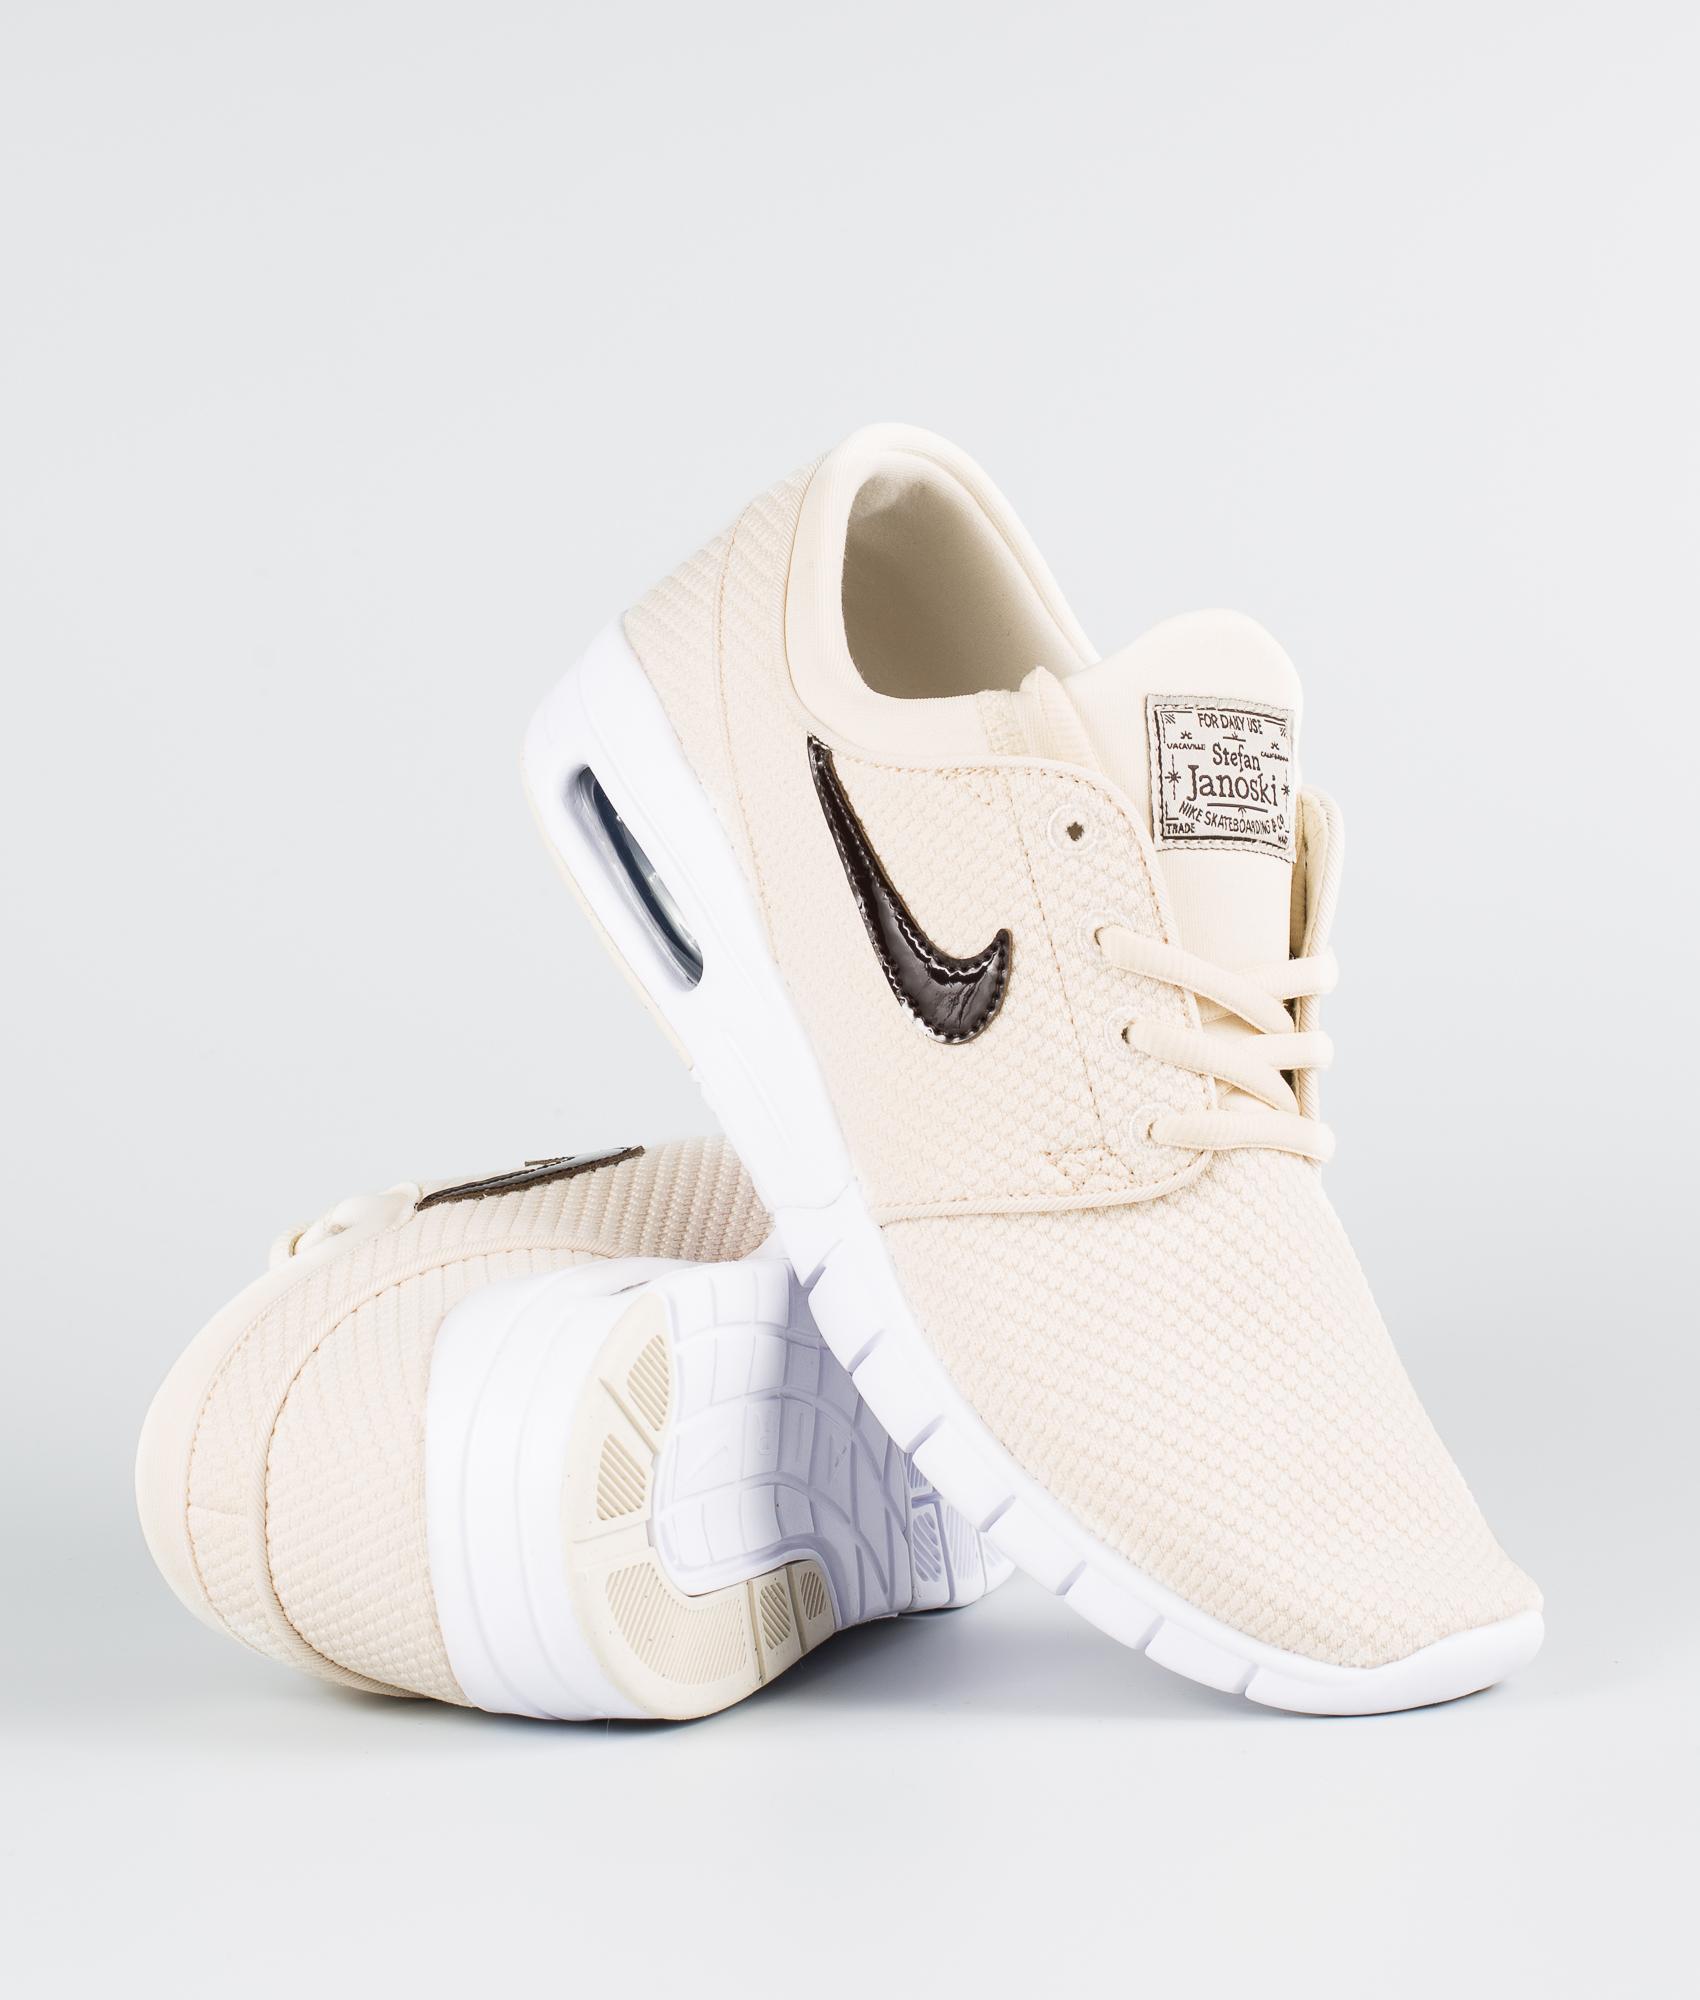 Compadecerse Congelar análisis  Nike Stefan Janoski Max Shoes Light Cream/Velvet Brown-White - Ridestore.com